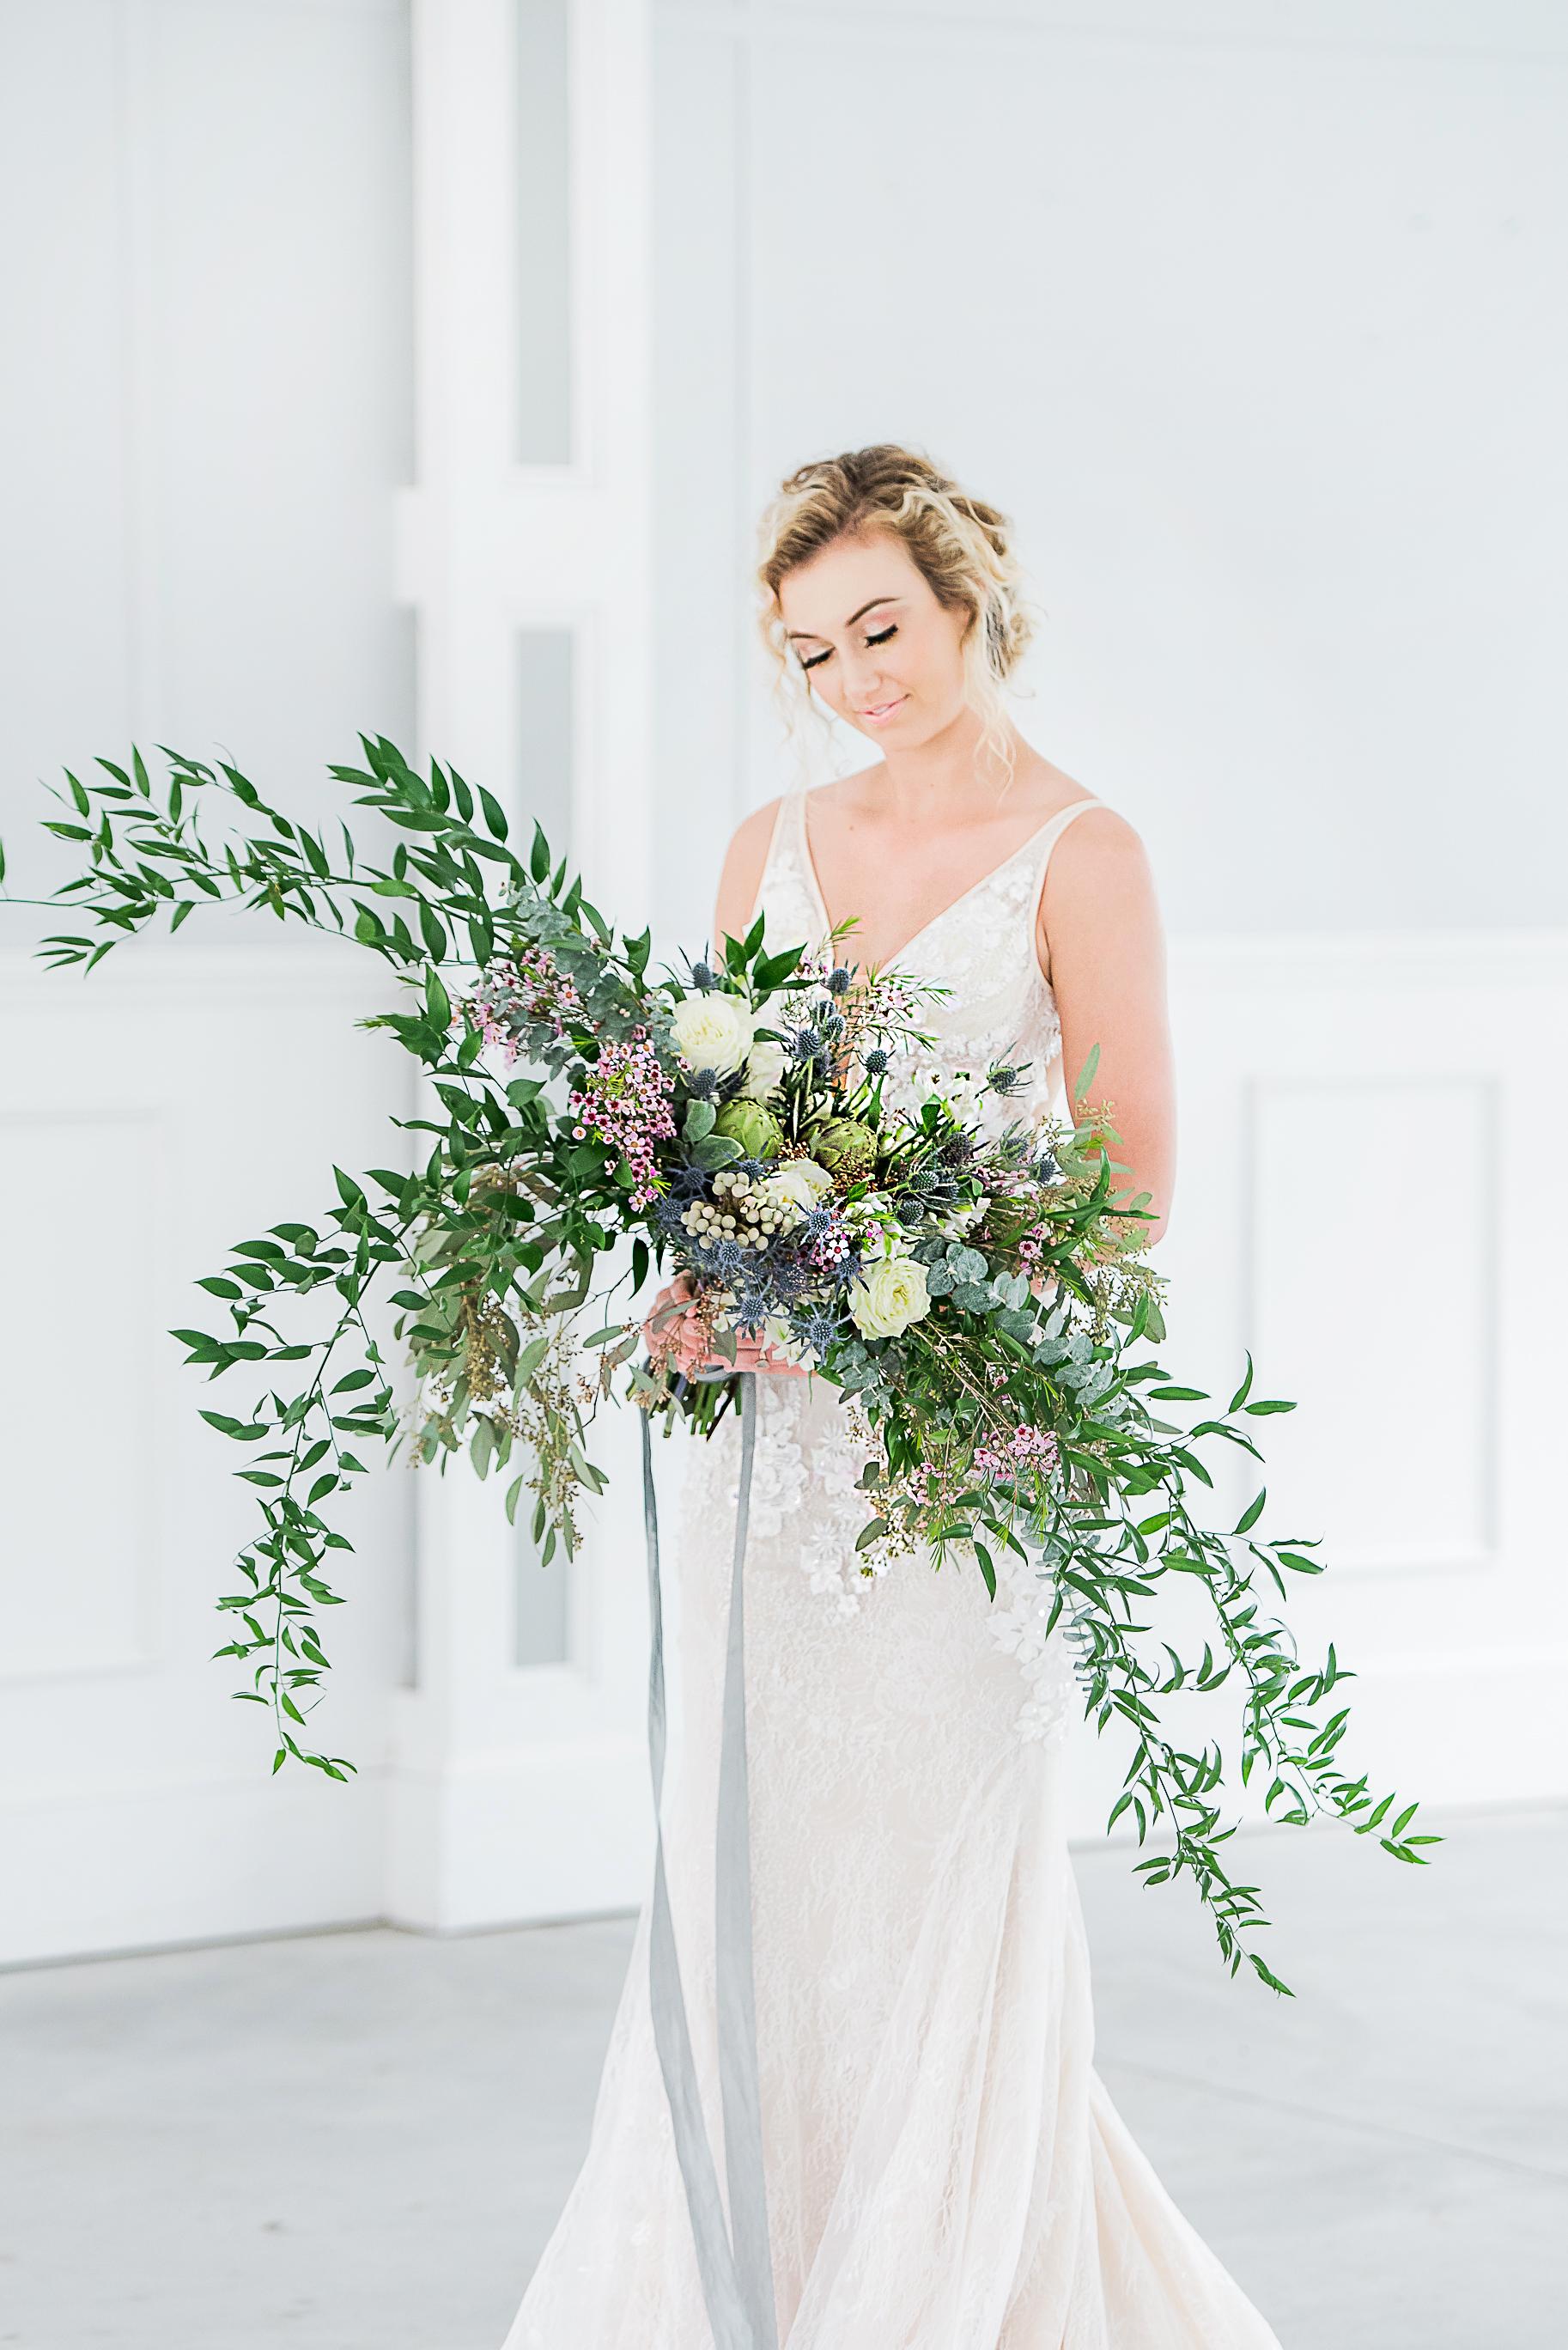 big cascade bouquet wide seasonal flower bouquet modern bouquet for modern bride mermaid fit court train wedding gown